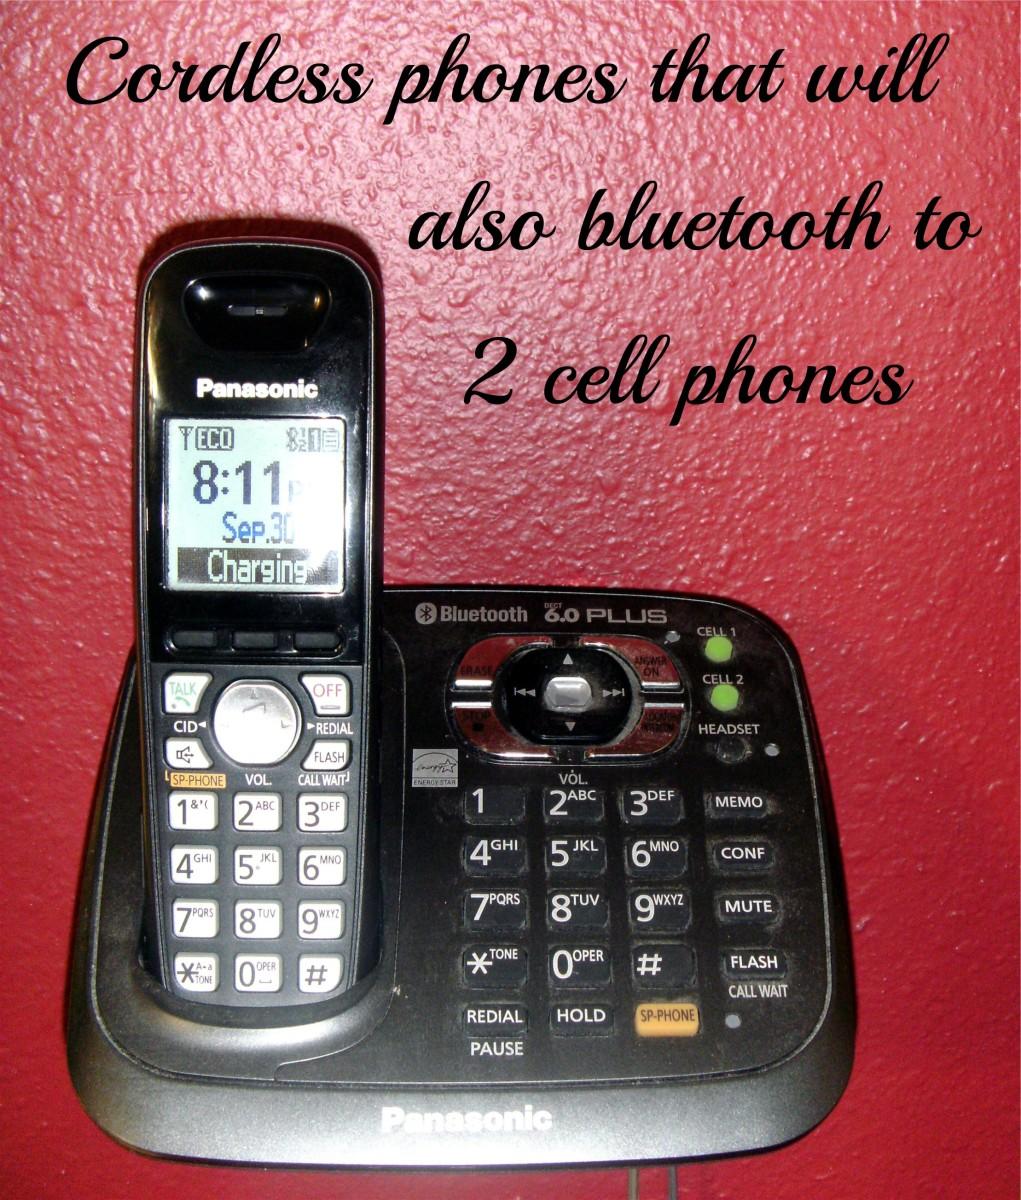 A Cordless Bluetooth Home Phone Review: Panasonic KX-TG Phones